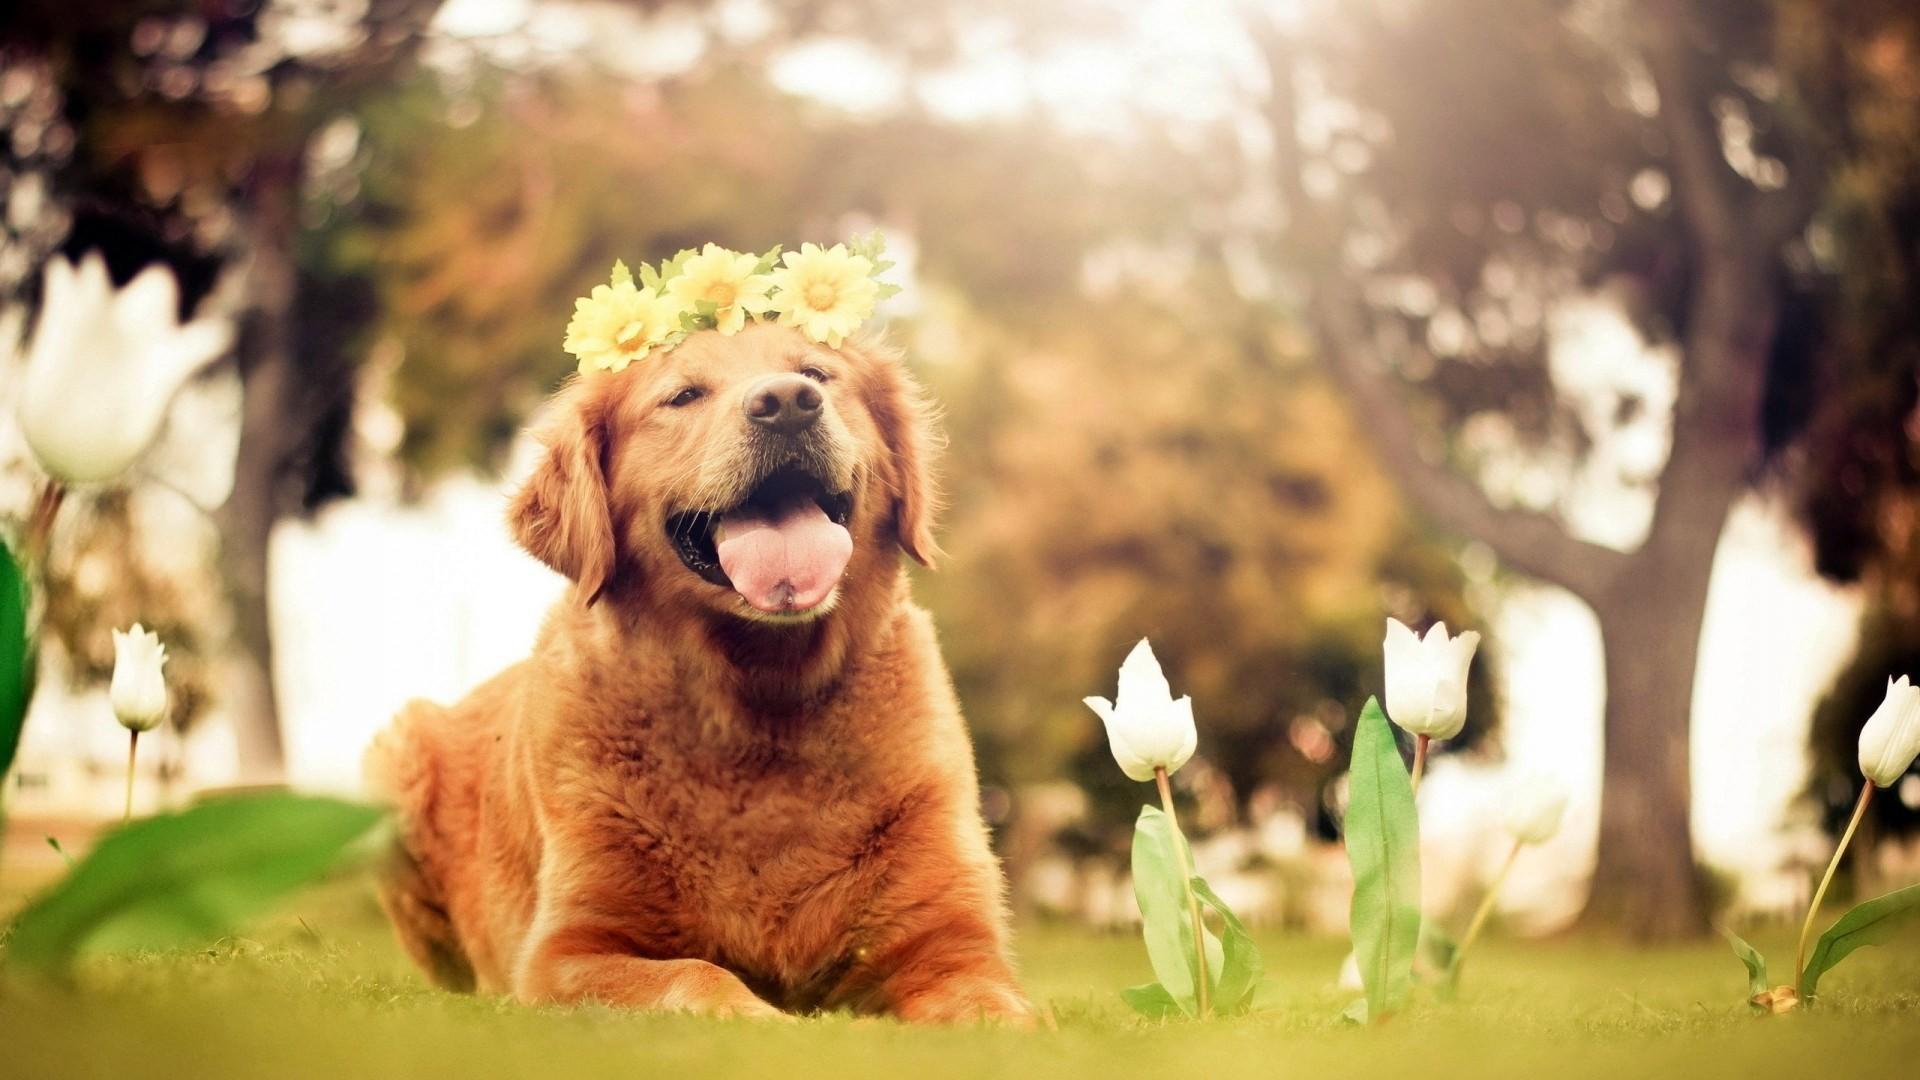 Dogs Desktop Backgrounds – Wallpaper, High Definition, High Quality .